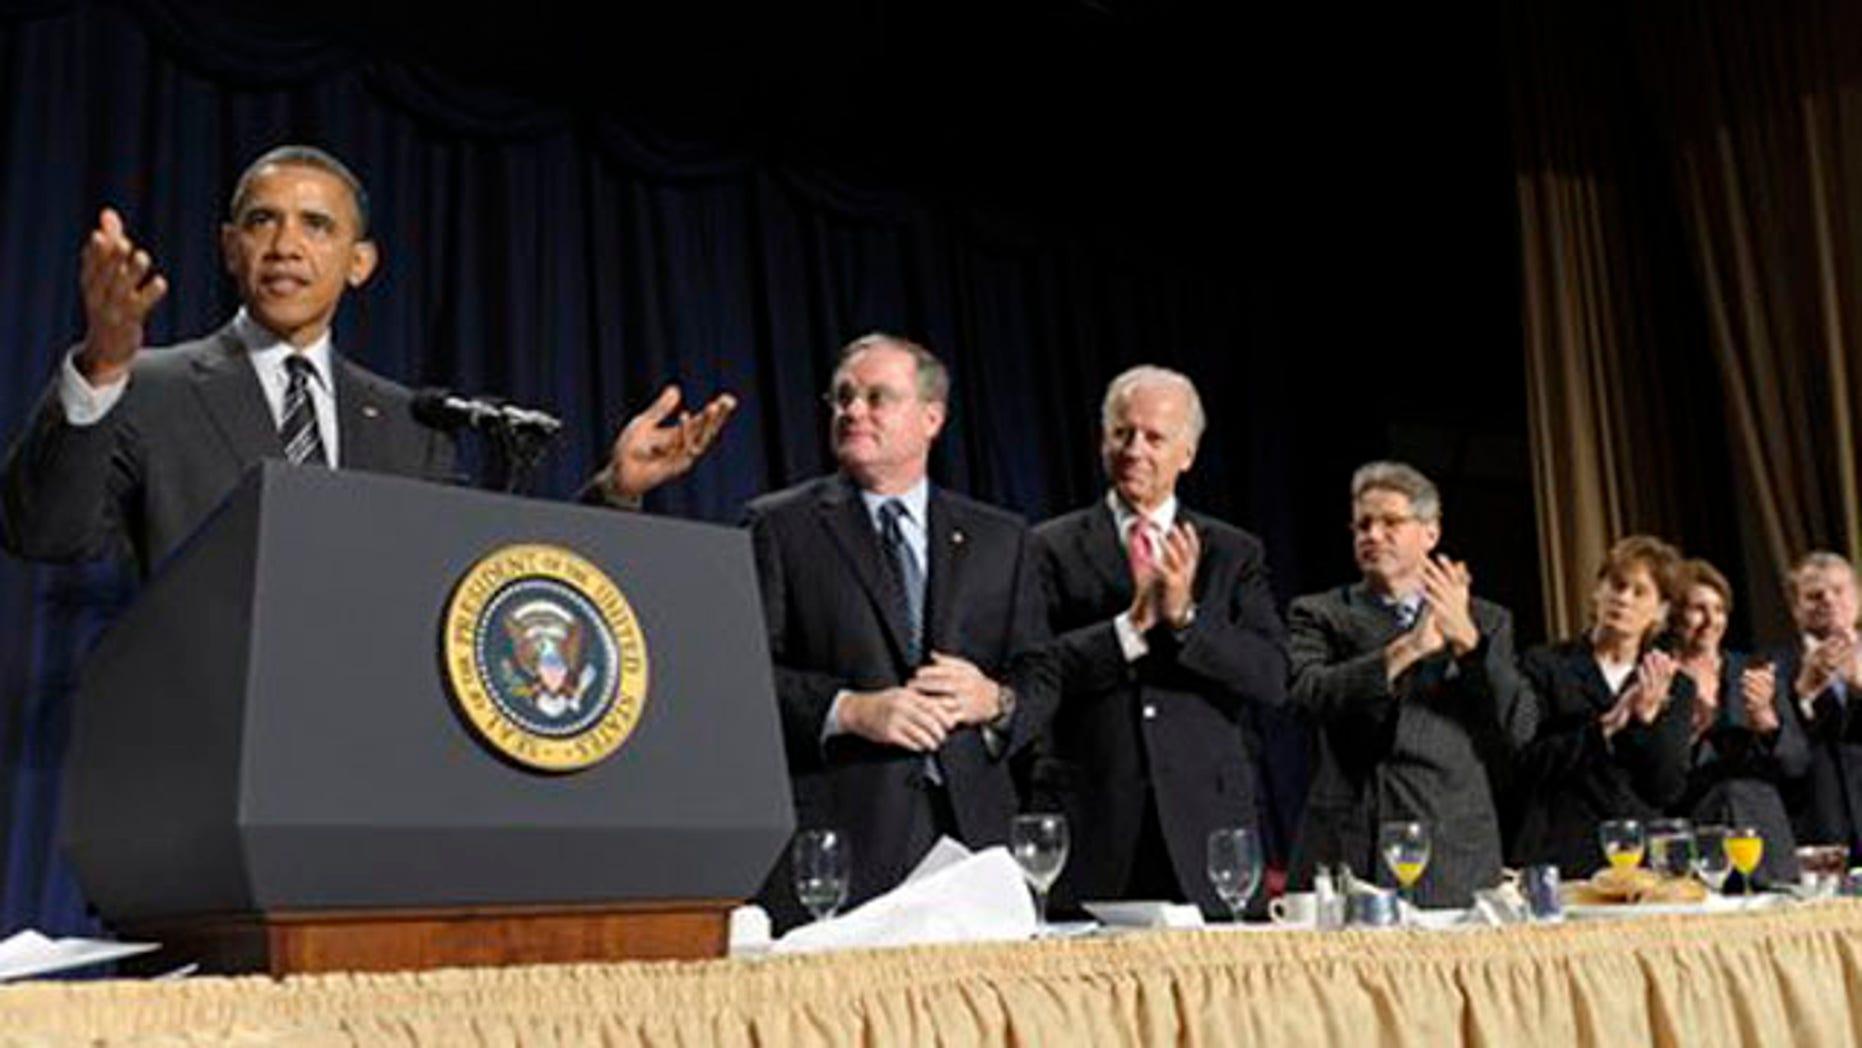 Feb. 2, 2012: President Barack Obama gestures while speaking at the National Prayer Breakfast in Washington.